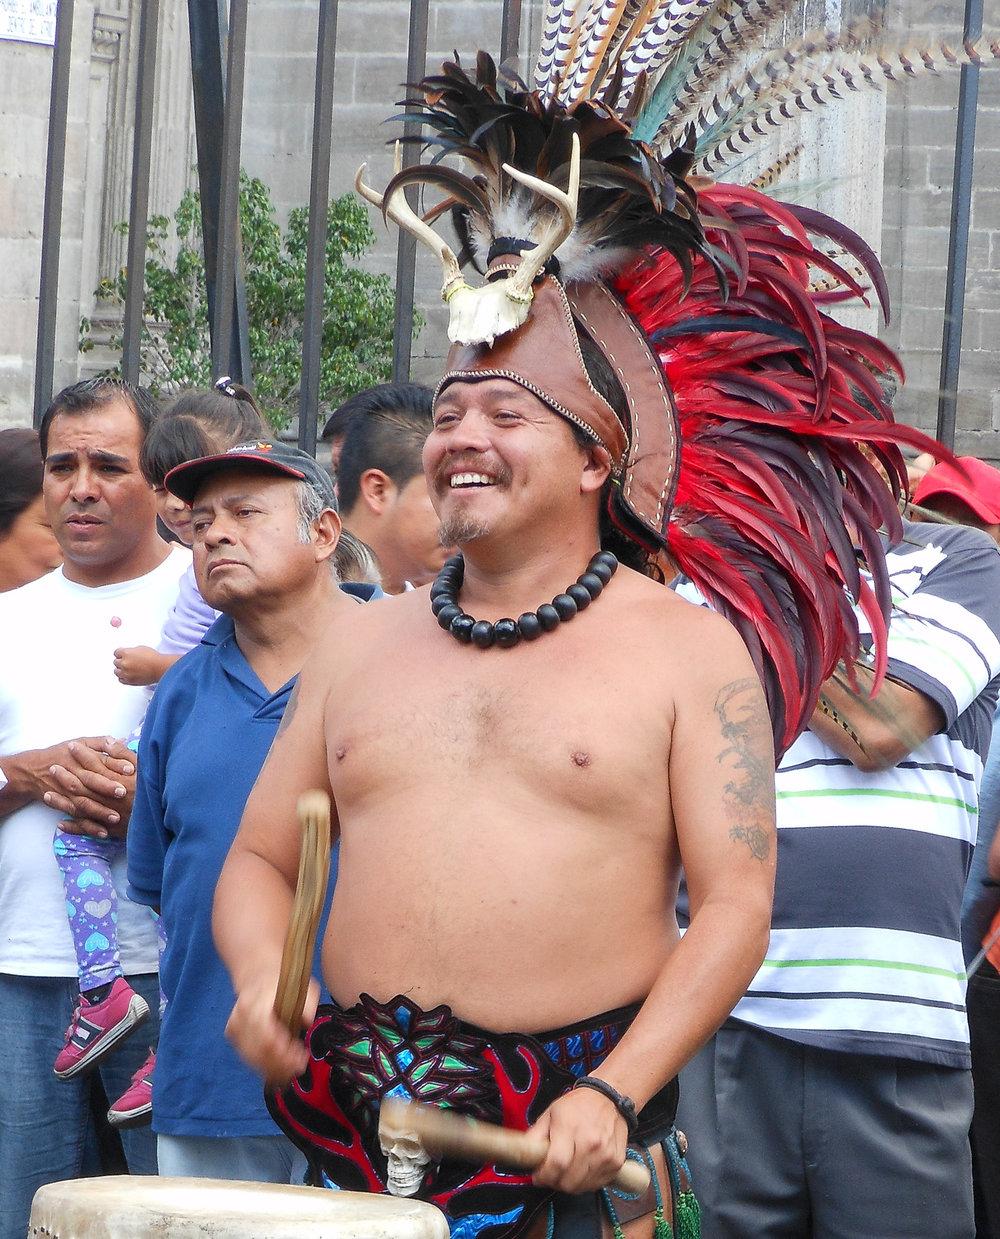 MEXICO CITY, MEXICO.